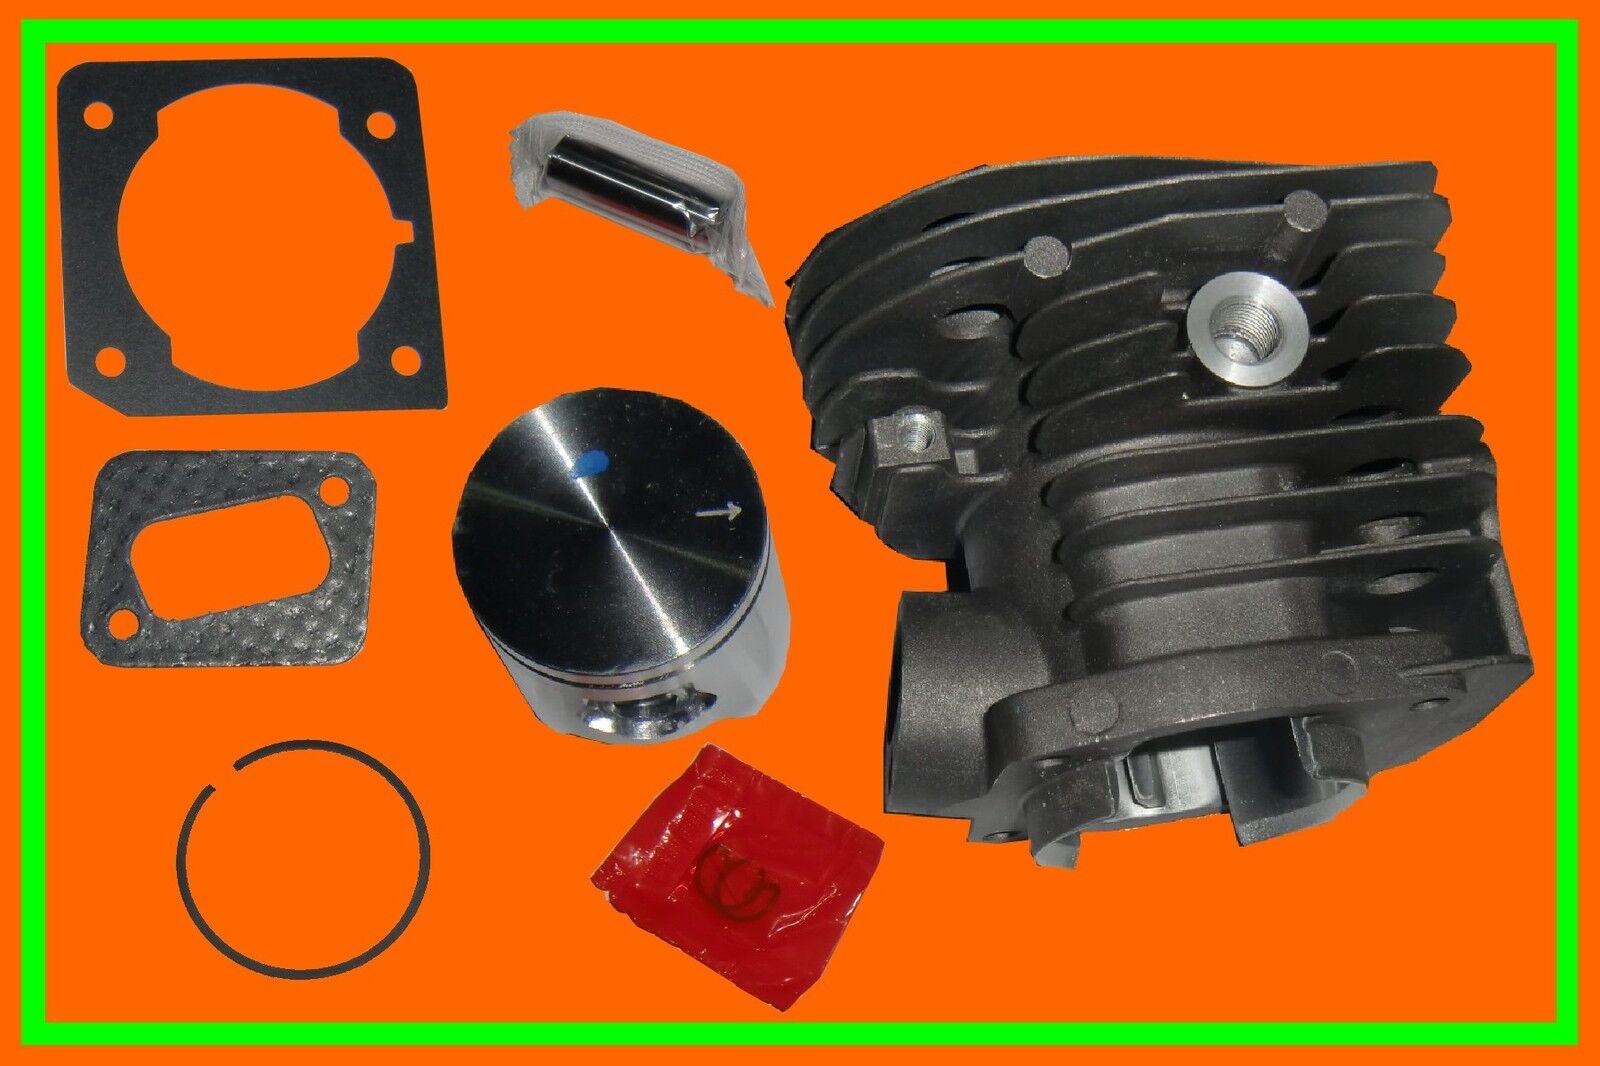 Kolben Zylinder passend Husqvarna 346xp  new  44mm motorsäge kettensäge neu